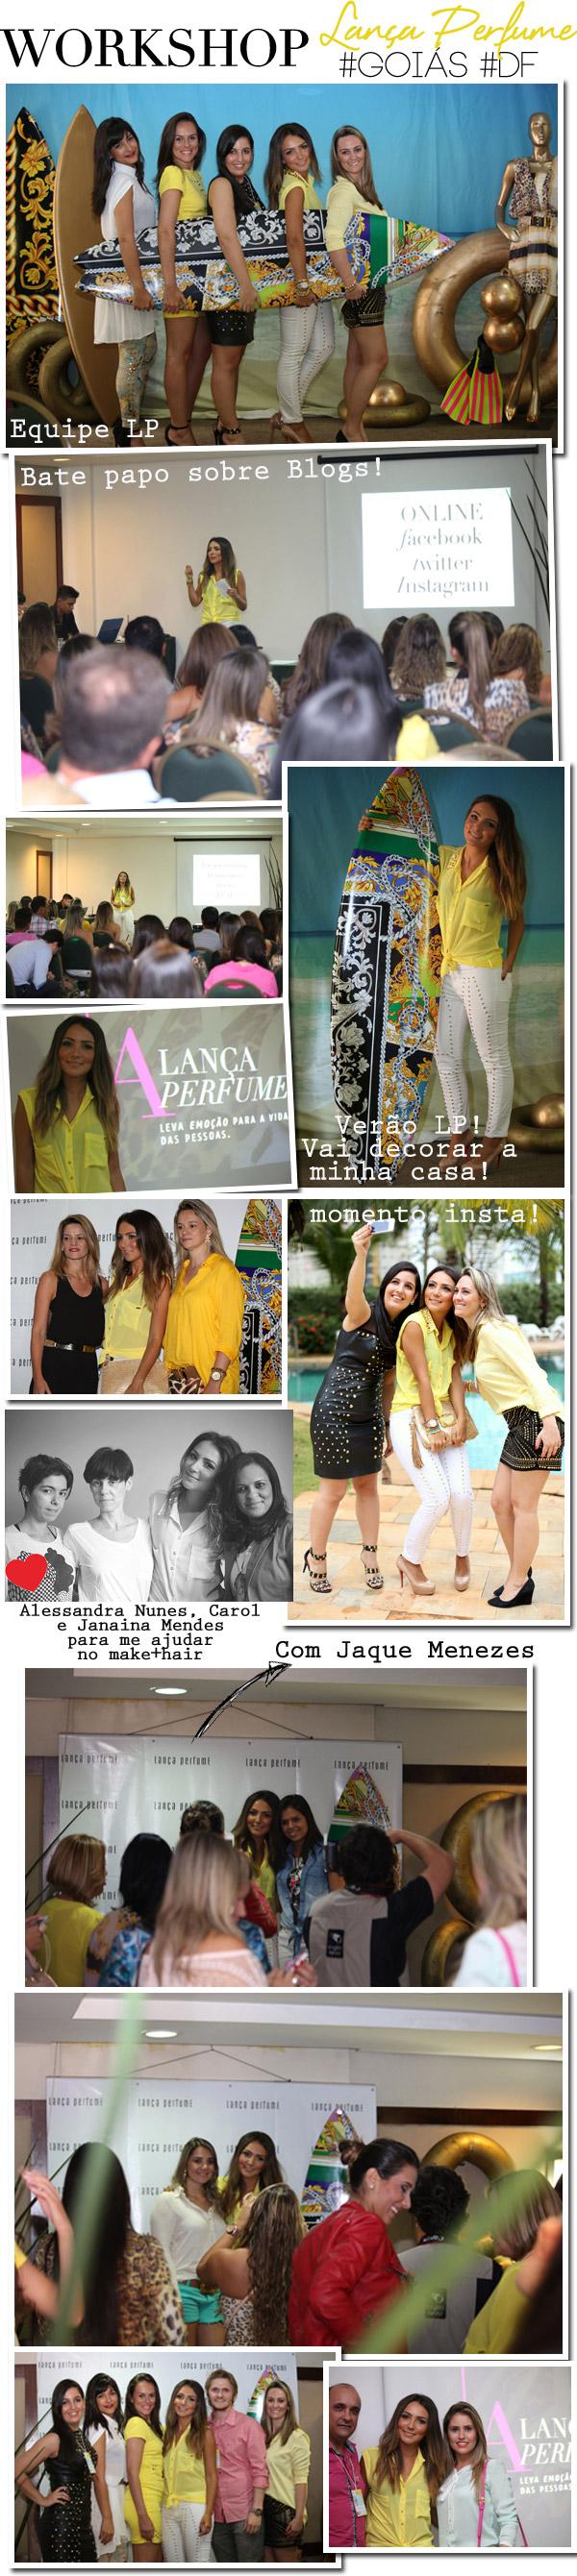 workshop-lanca-perfume-goias-lala-noleto